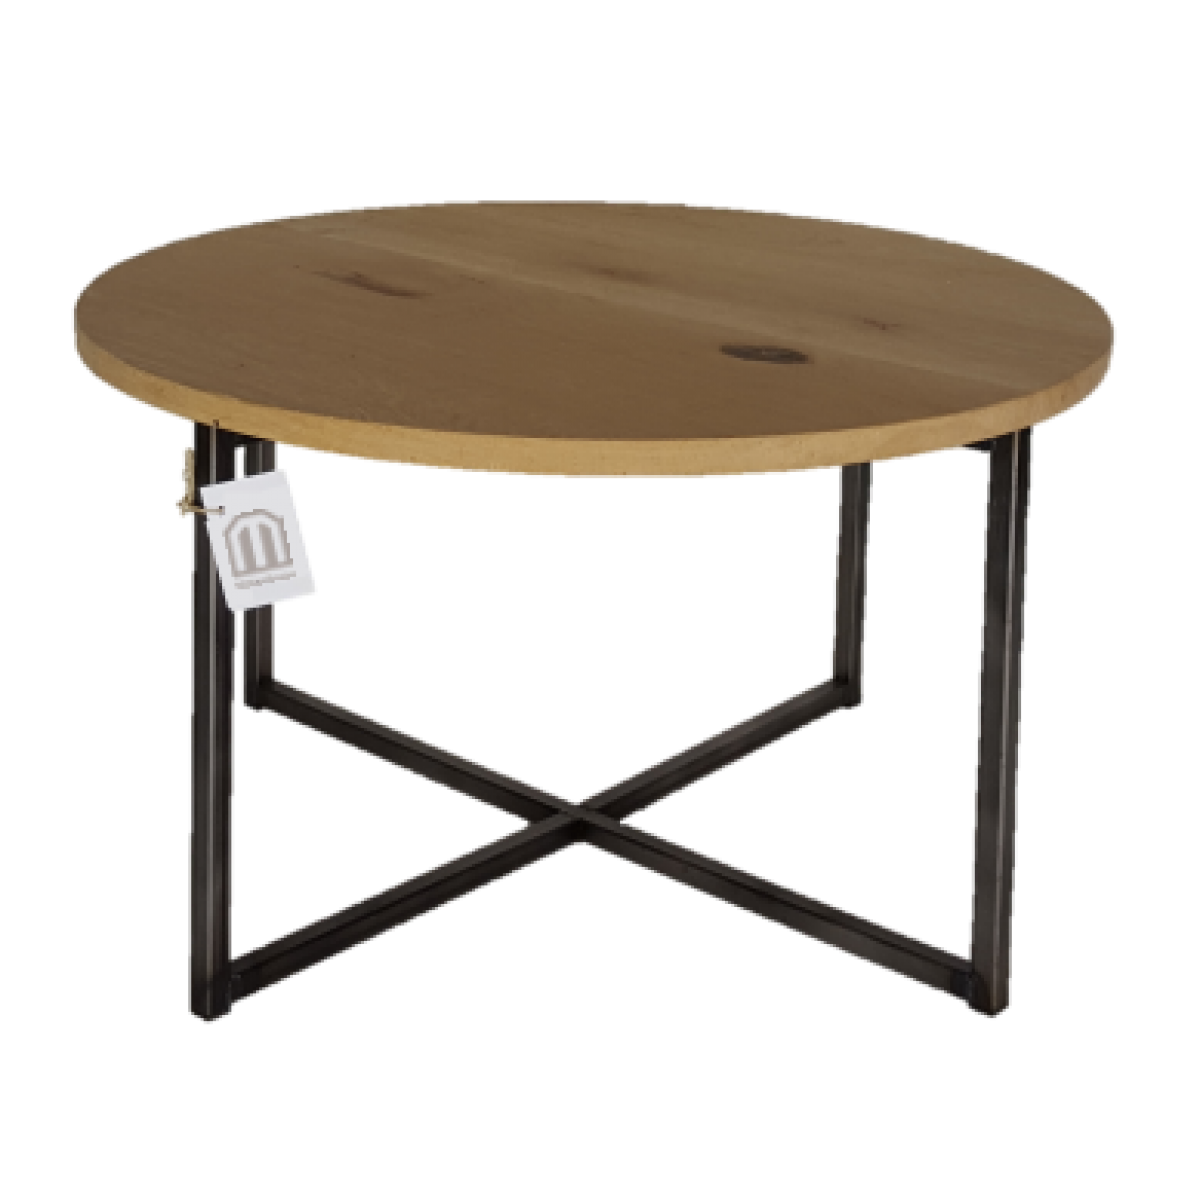 salontafel-rond-metaalframe-eiken-blad-75x75-60x60-cm-gerookt